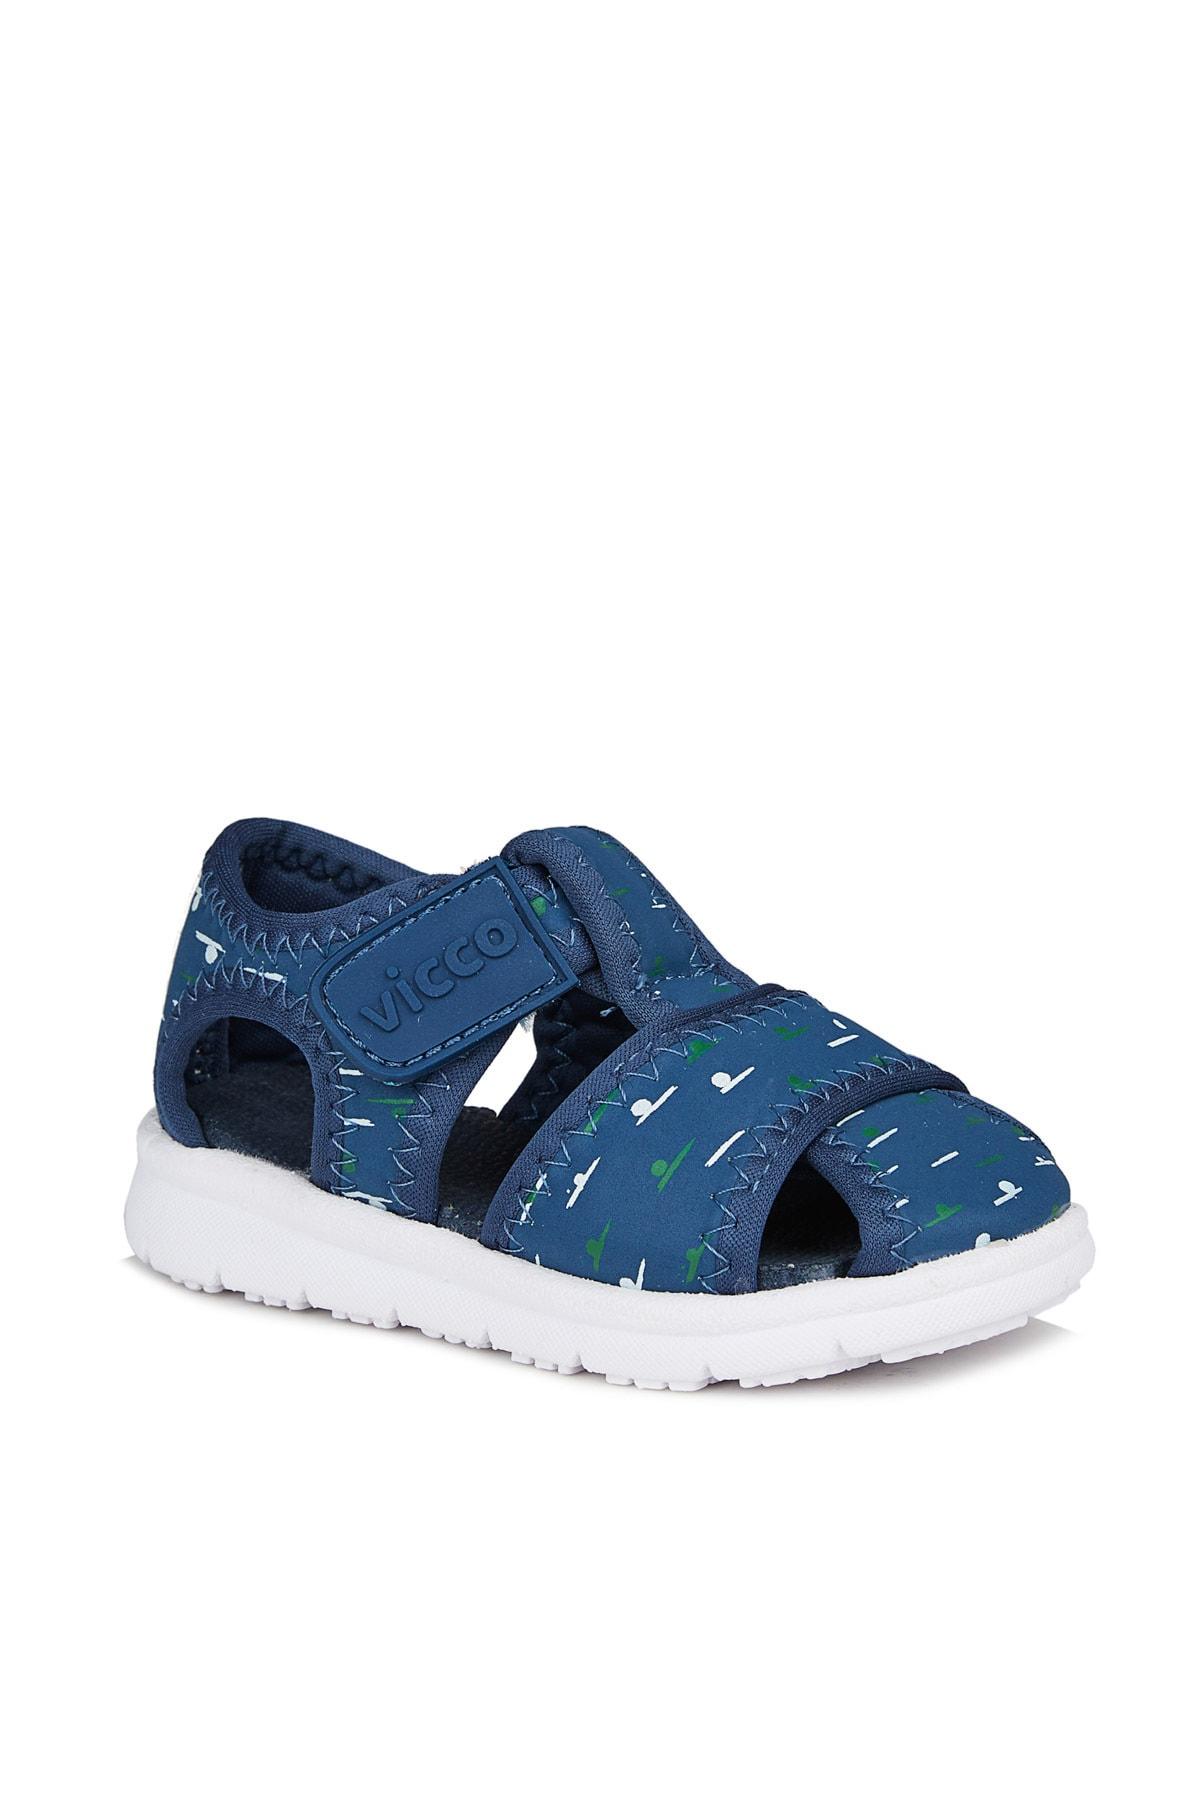 Vicco Bumba Erkek Bebe Lacivert Sandalet 1